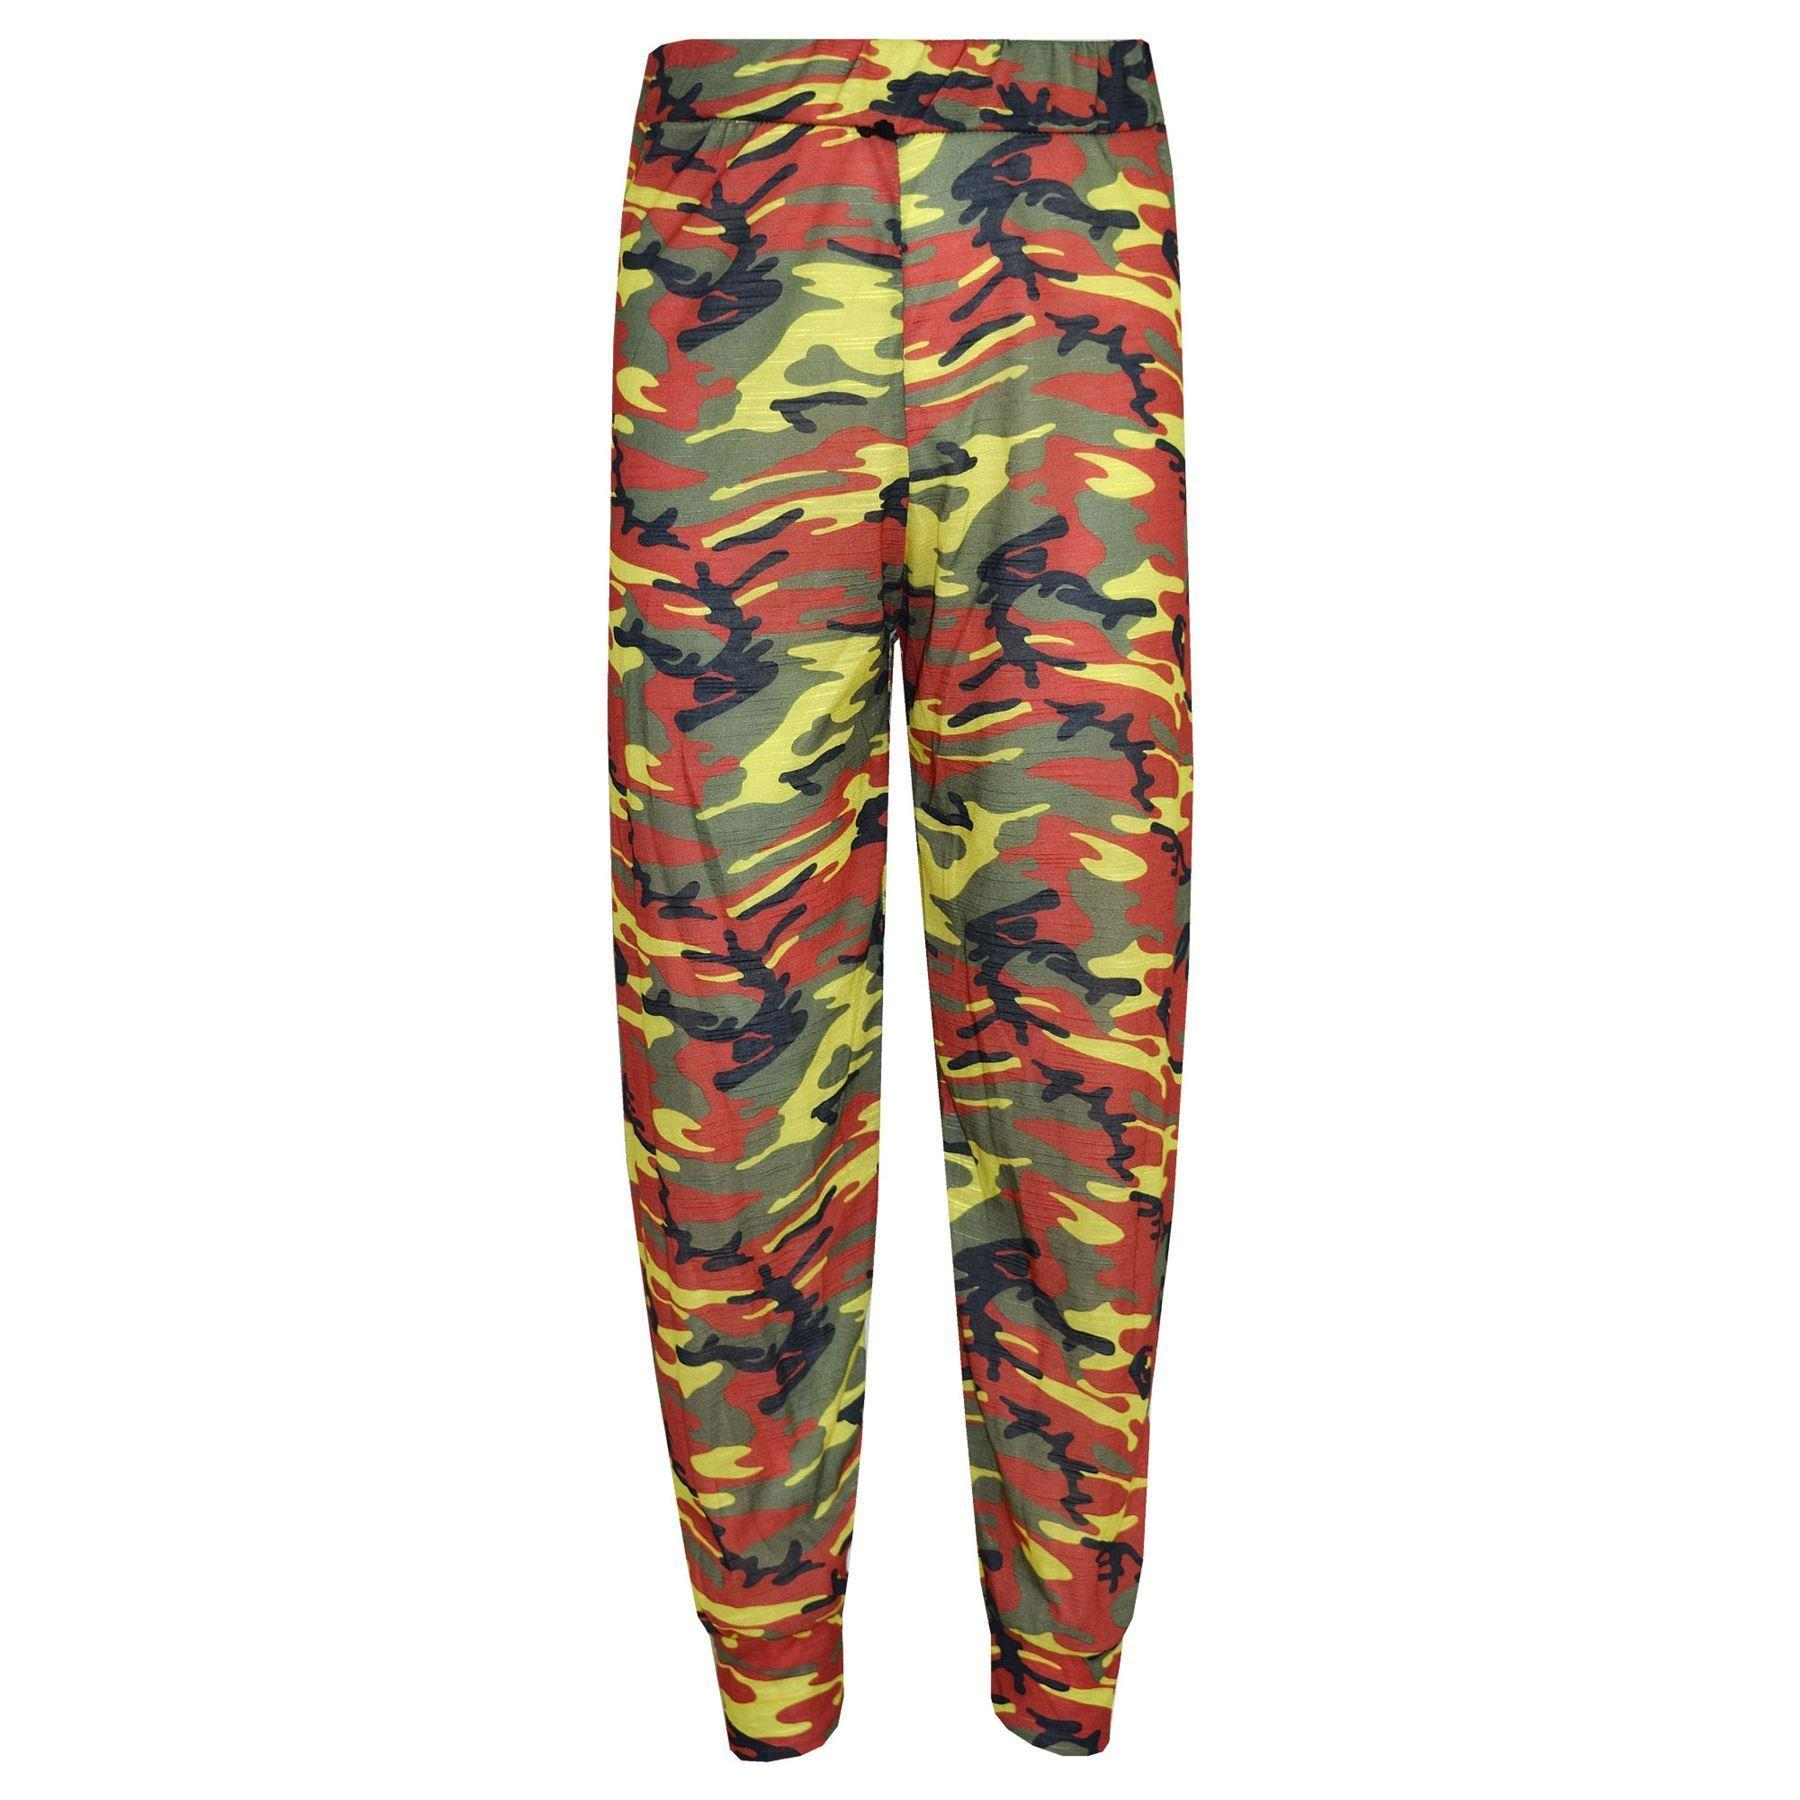 Girls-NEW-YORK-BROOKLYN-98-ATHLECTIC-Camouflage-Print-Top-amp-Legging-Set-7-13-Yr thumbnail 27